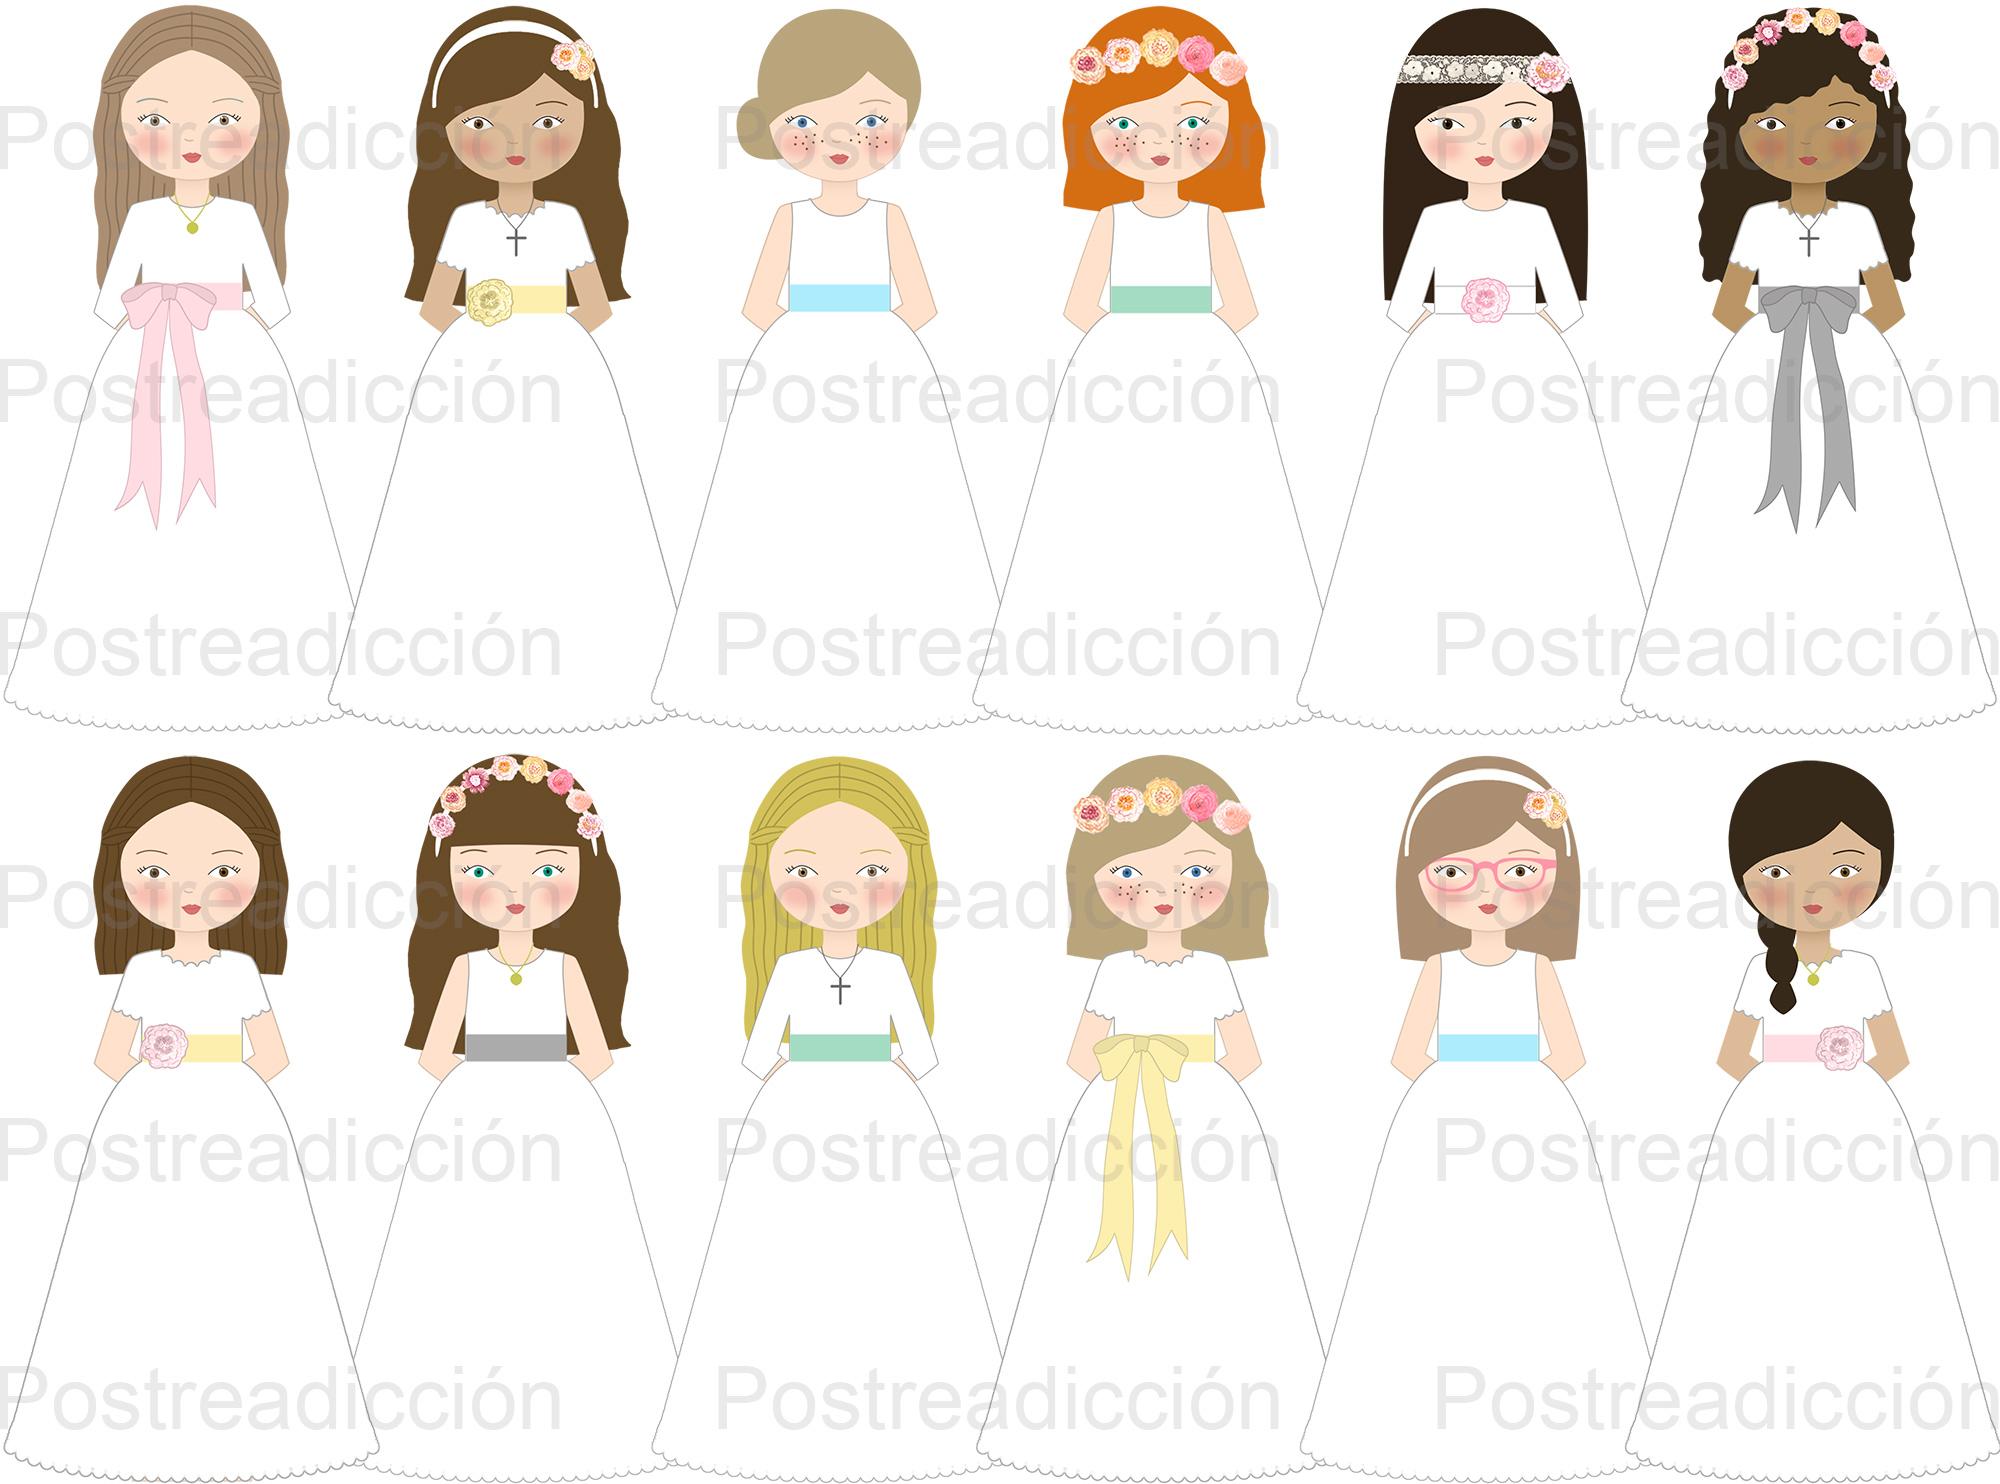 Imagen de producto: https://tienda.postreadiccion.com/img/articulos/secundarias14027-kit-imprimible-de-comunion-carlota-liberty-betsy-ann-d-1.jpg